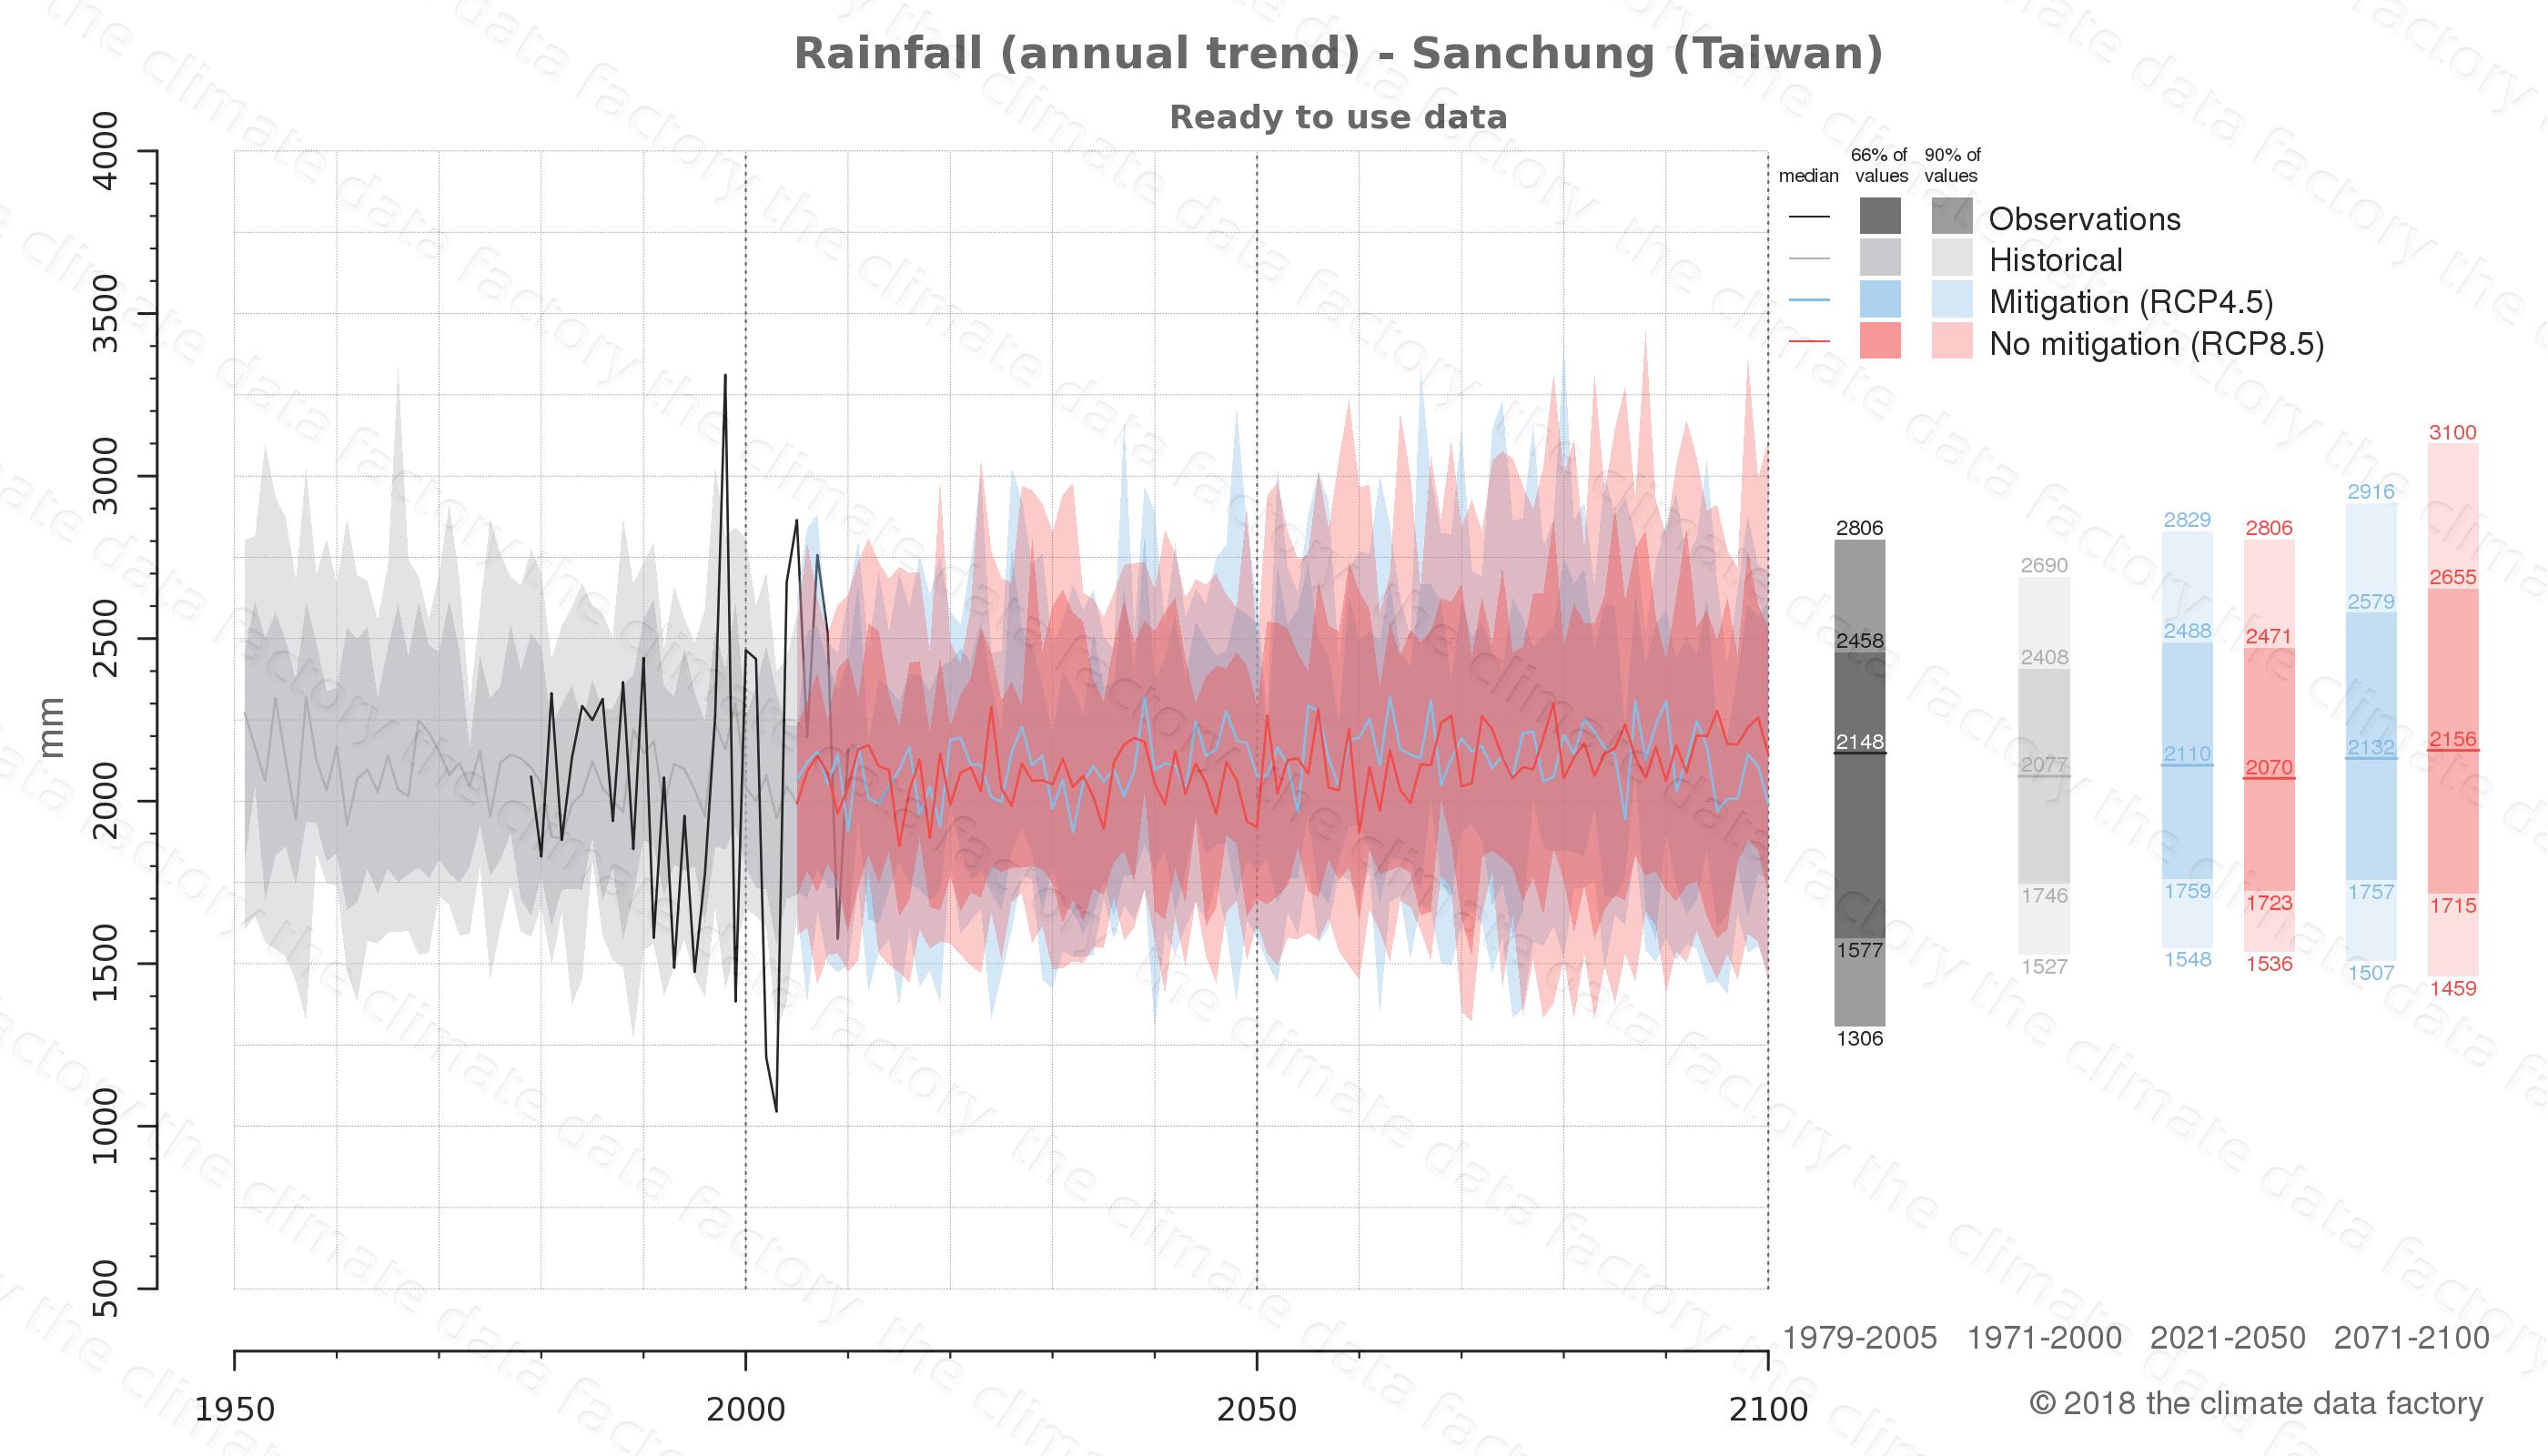 climate change data policy adaptation climate graph city data rainfall sanchung taiwan